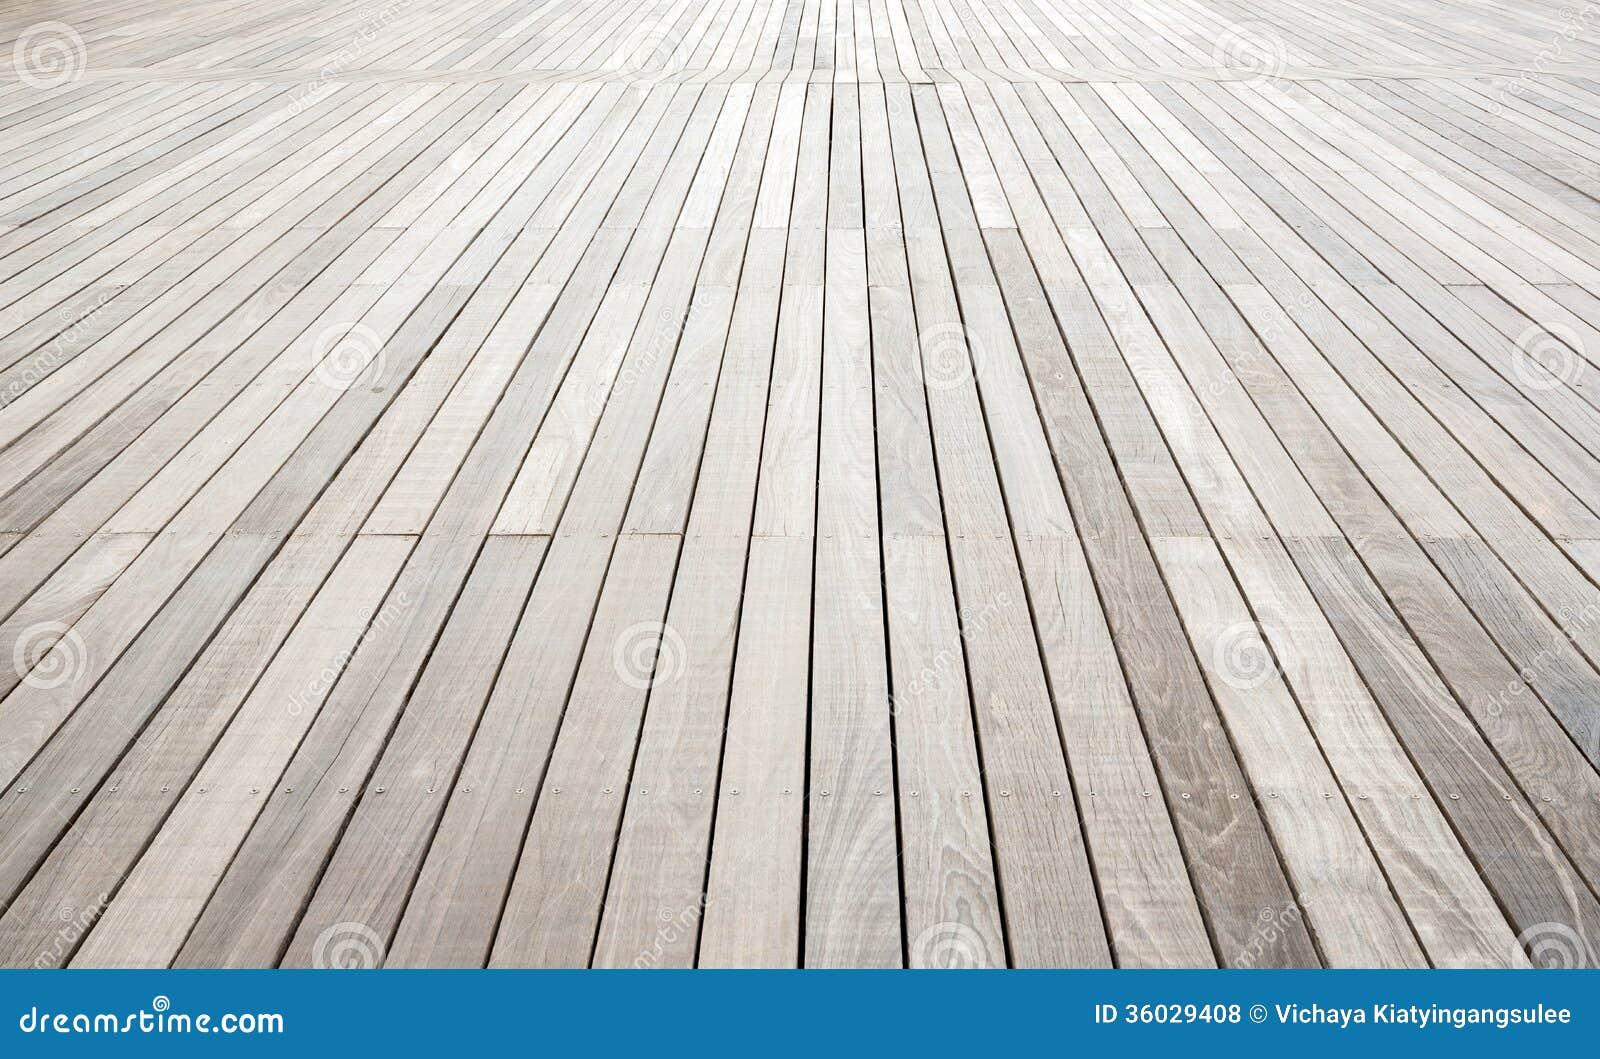 Wood Panel - Wood Panel Royalty Free Stock Photos - Image: 36029408